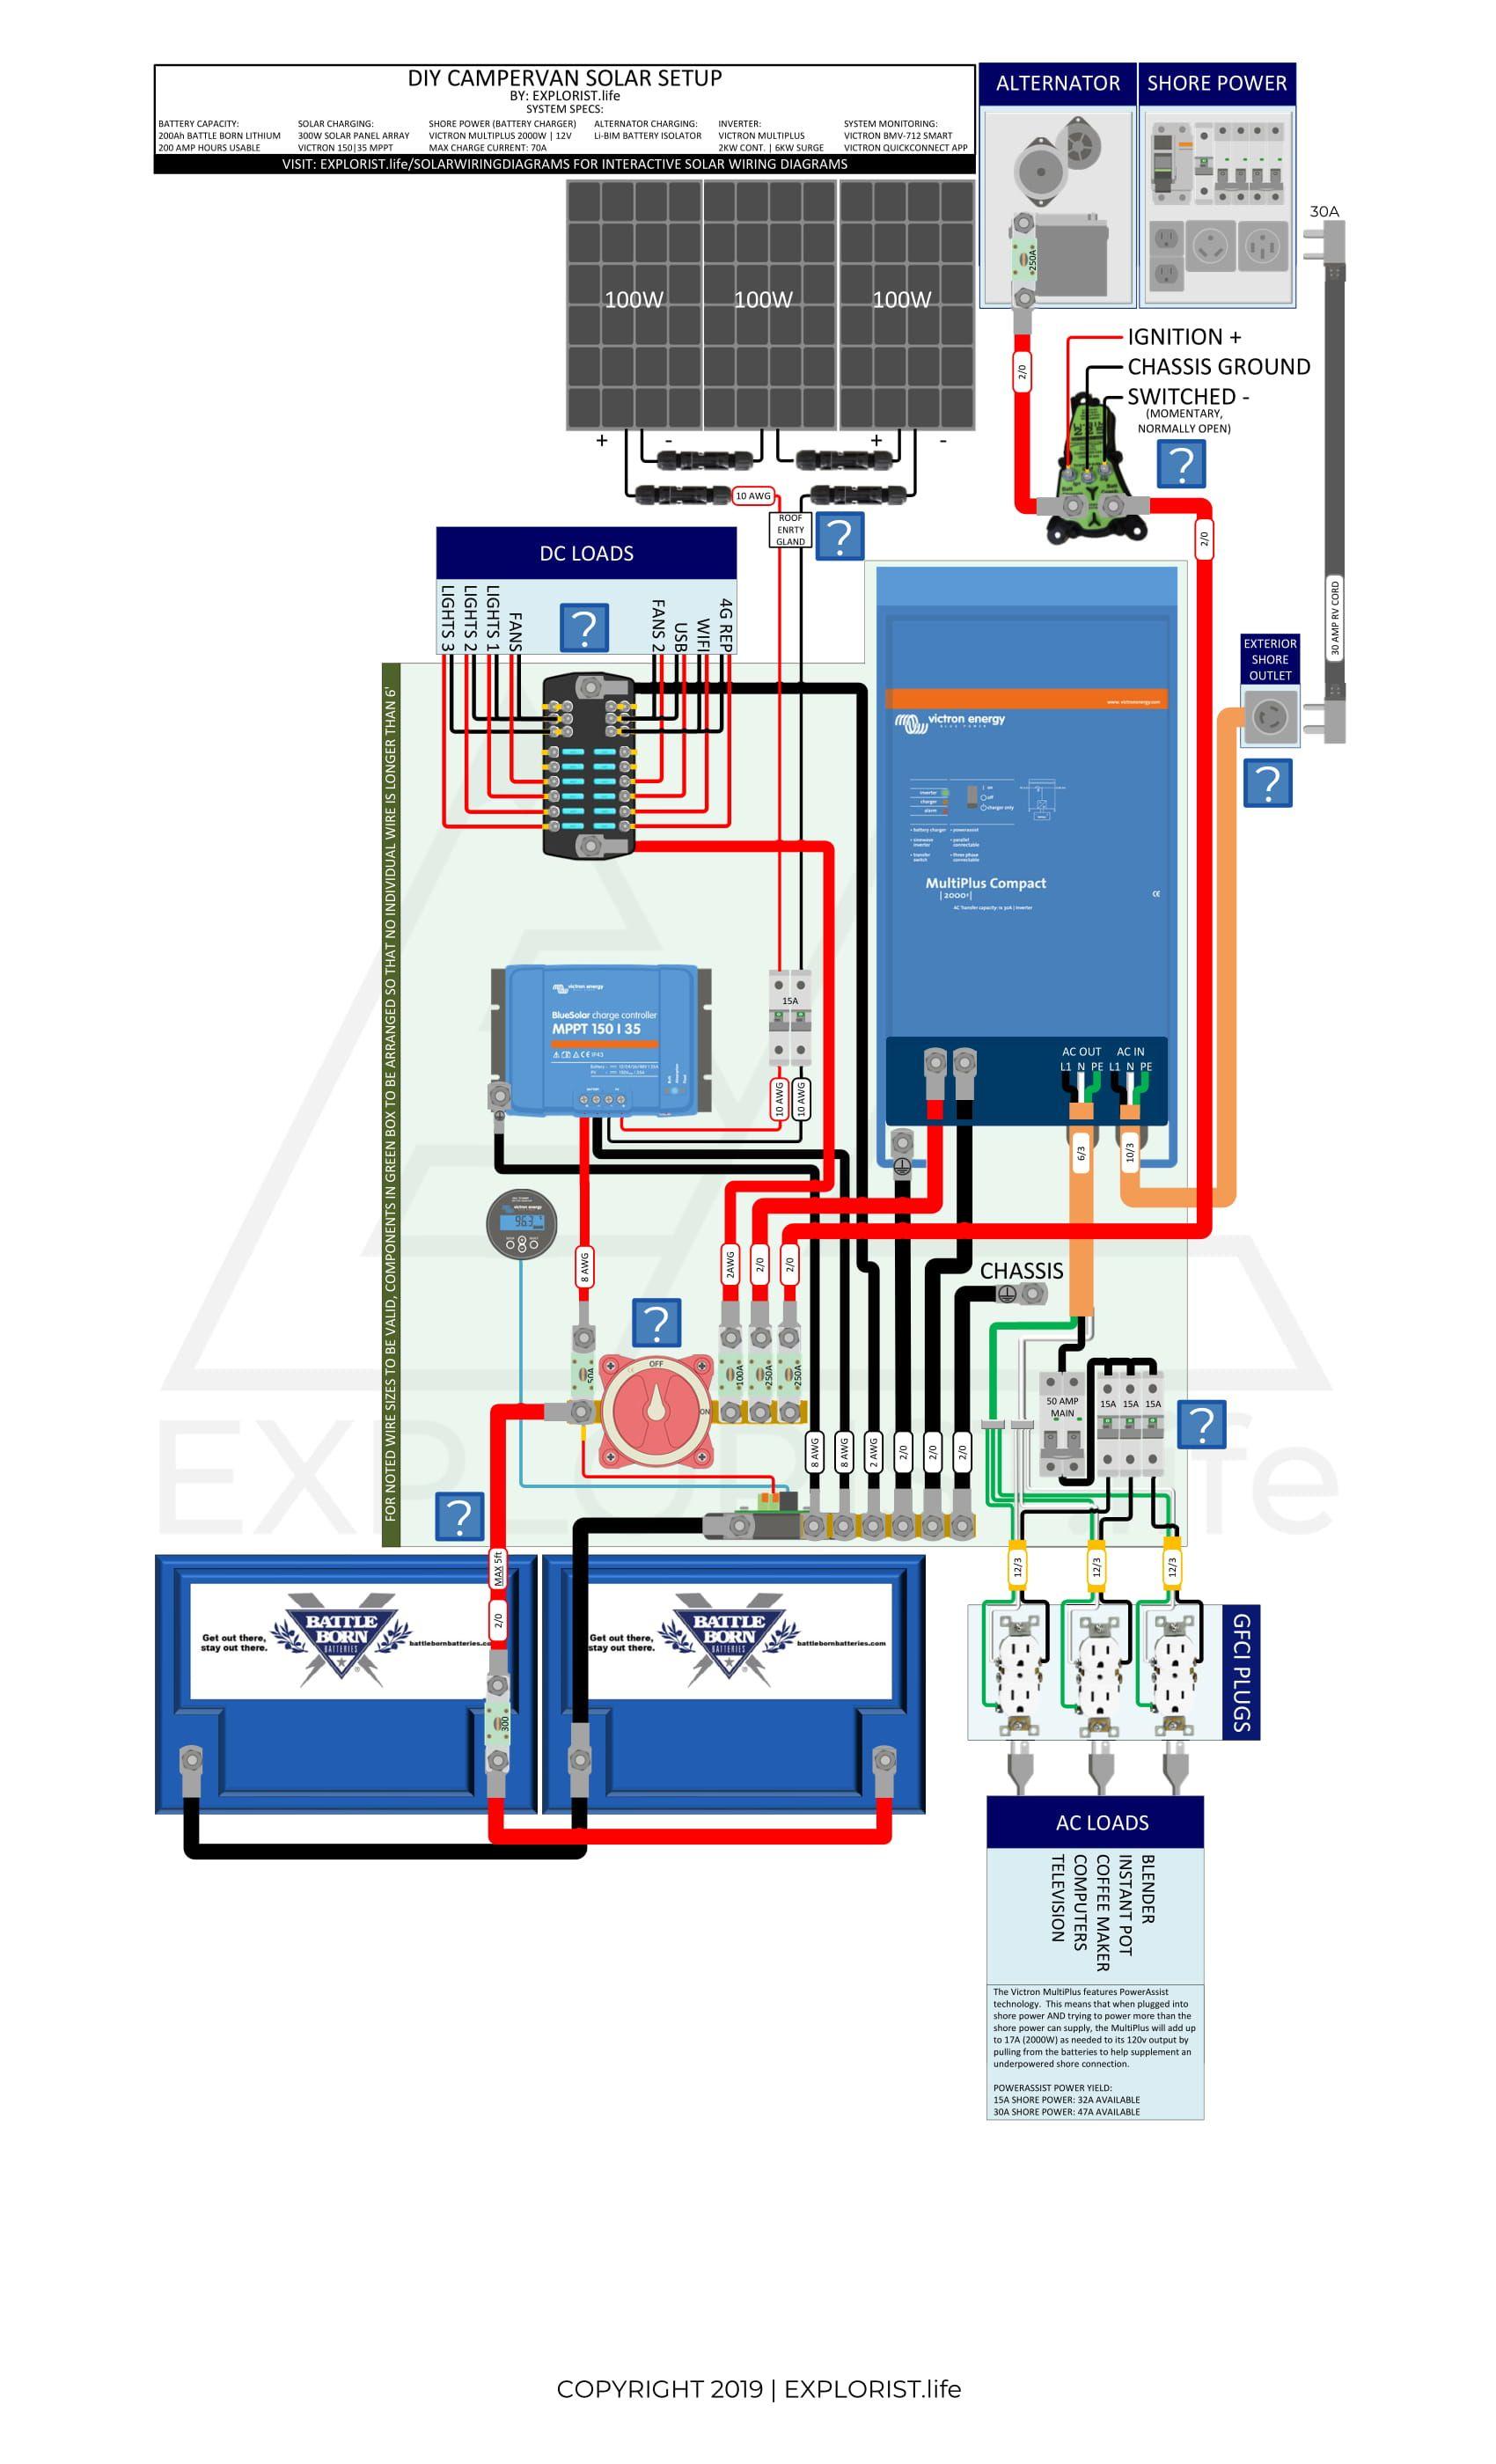 Interactive Diy Solar Wiring Diagrams For Campers Van S Rv S Diy Solar Solar Kit Solar Power Diy